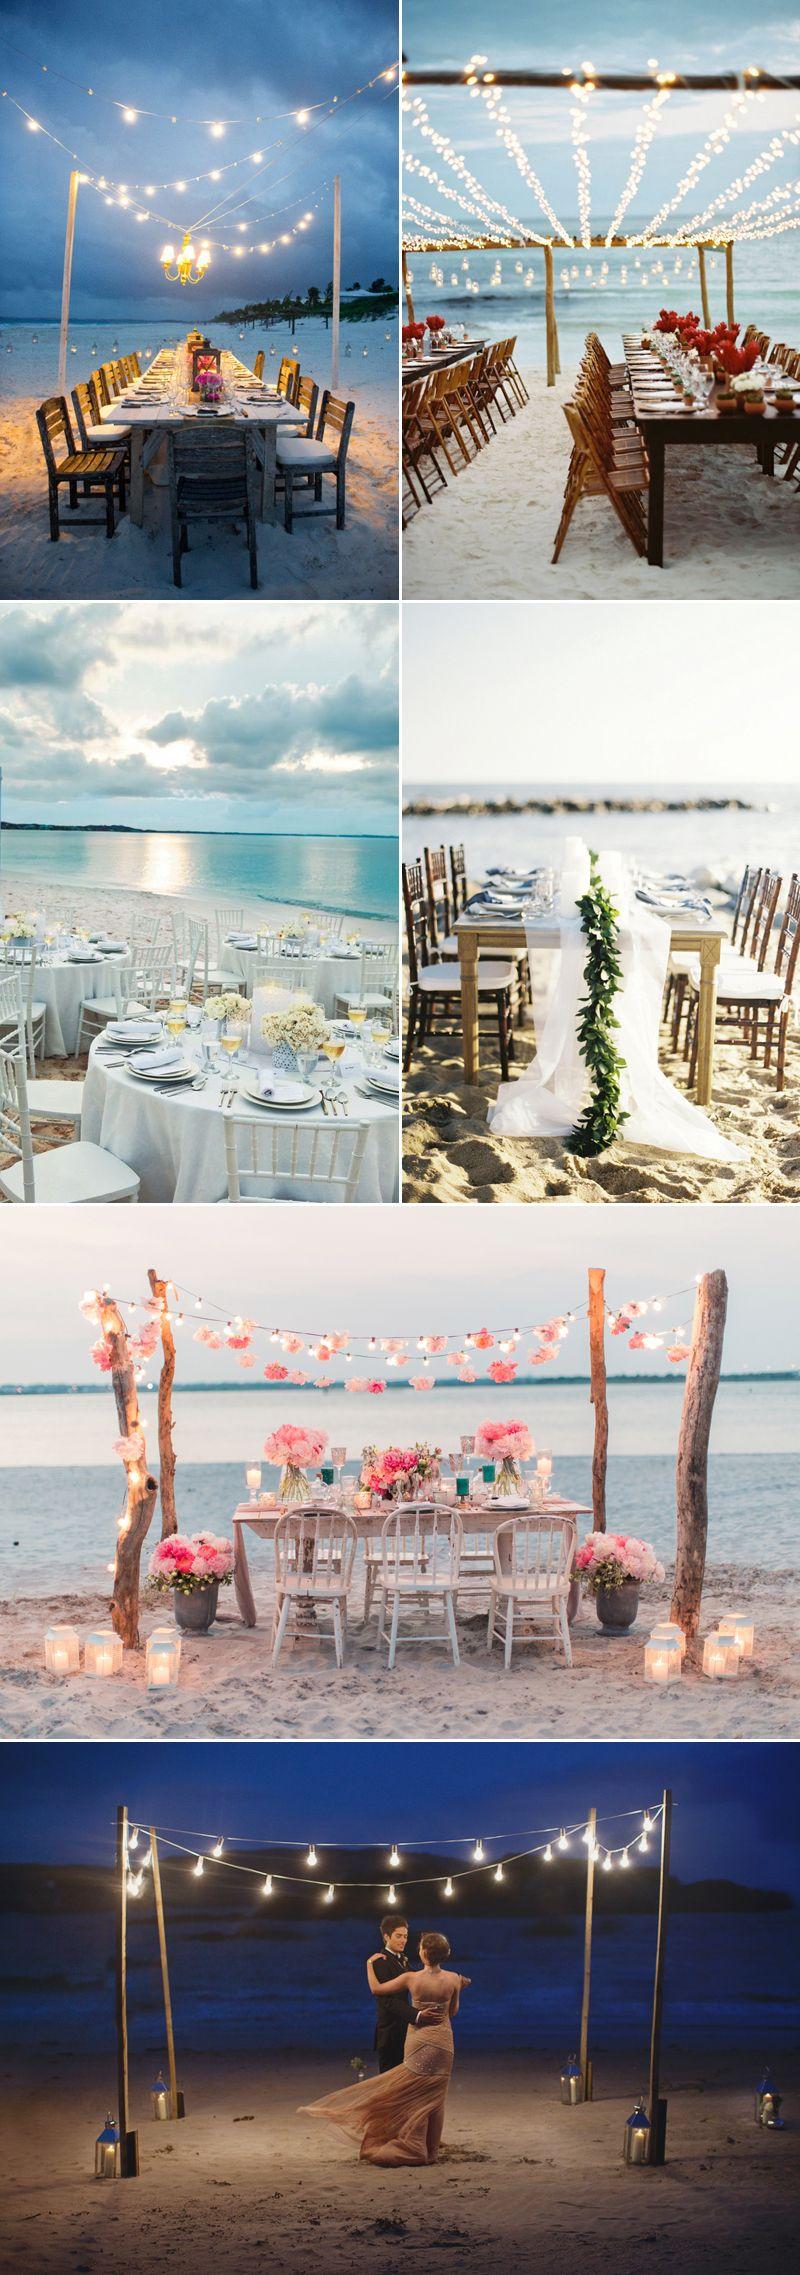 Wedding decoration ideas beach theme   Romantic Beach Themed Wedding Ideas  Signature style Creative